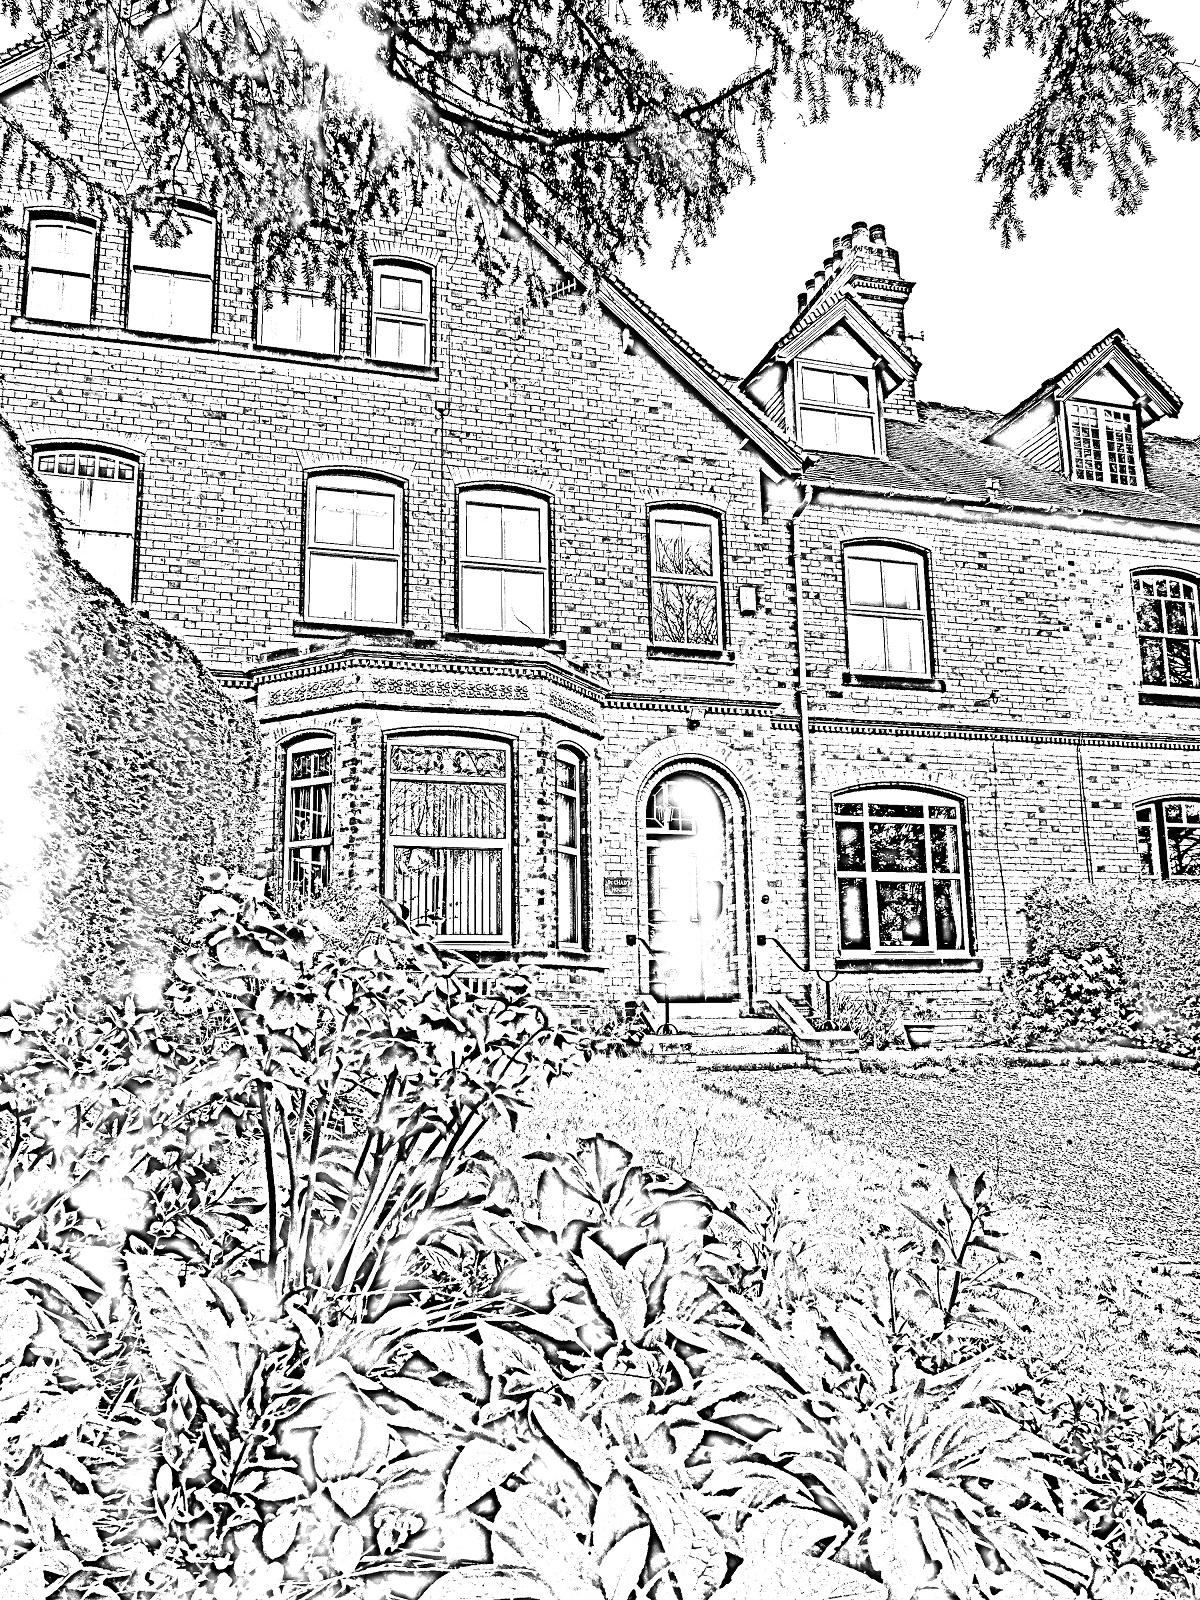 House-b+w-sketch-sm